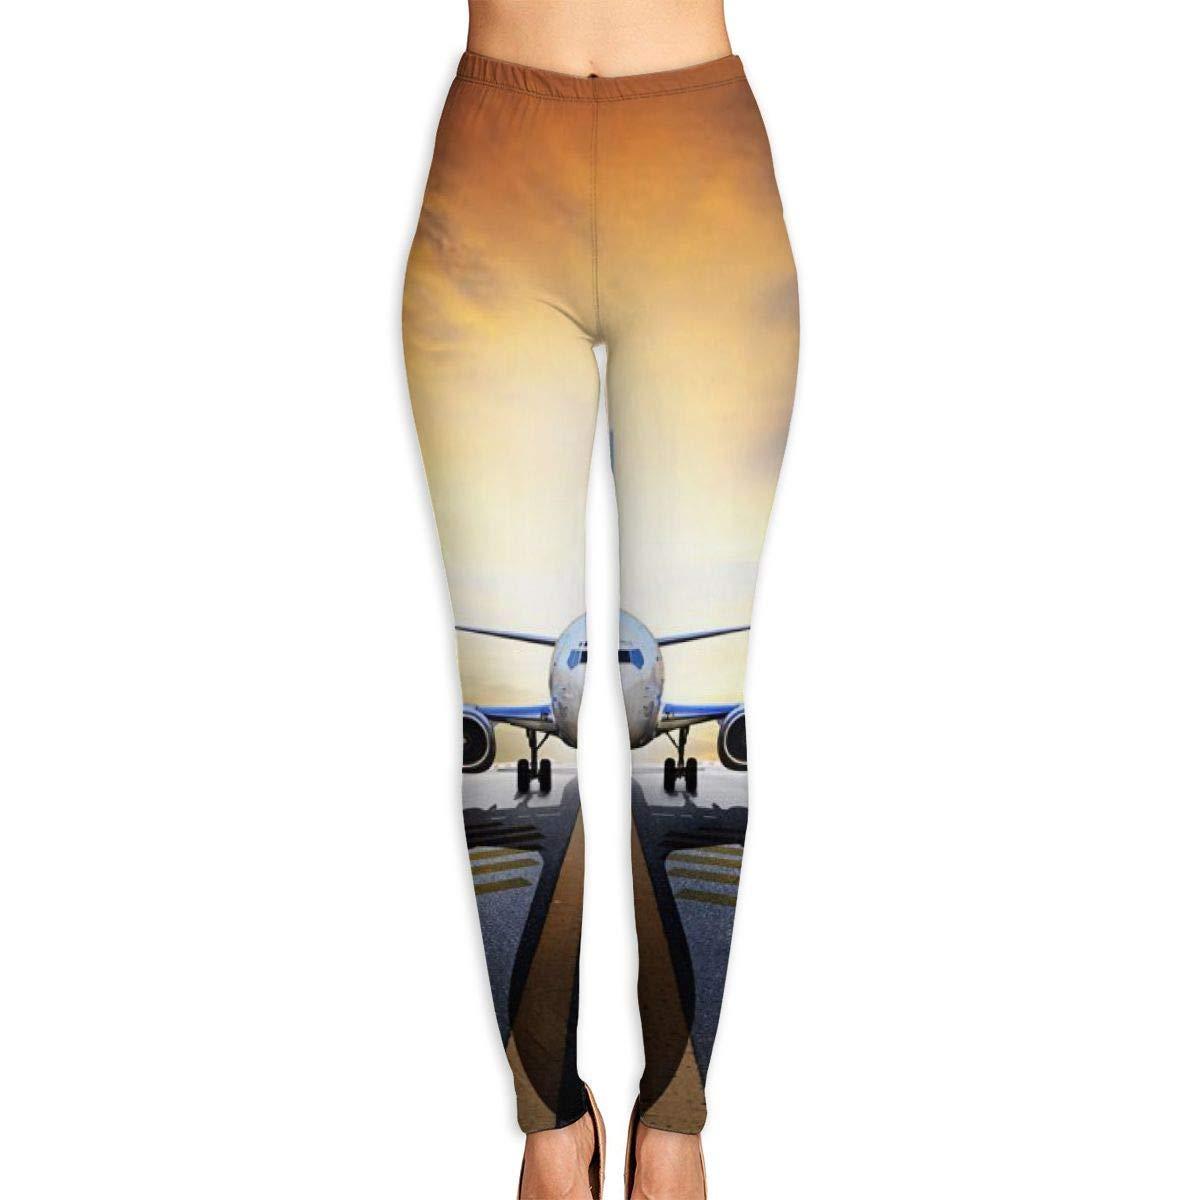 ANTOUZHE Sport Damen Leggings Backpack Airplane Printed Yoga Pants for Women Running Workout Yoga Capris Pants Leggings Graphic Running Clothing